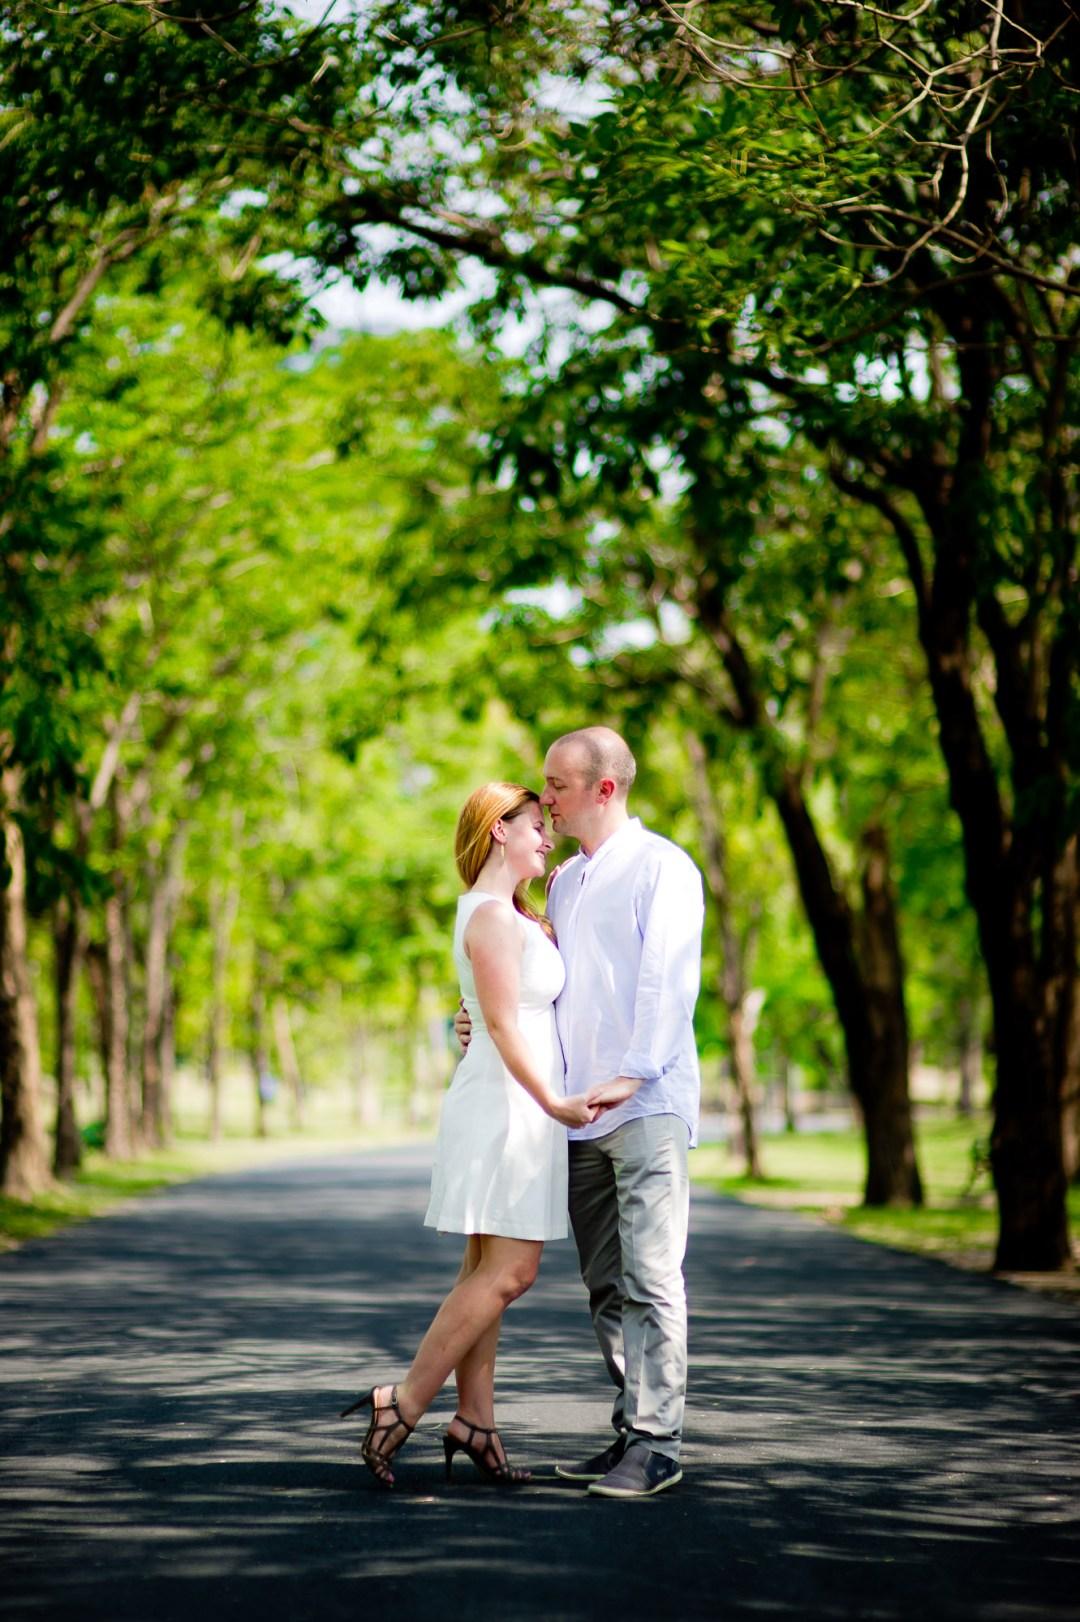 Bangkok Wedding Photography | Rod Fai Park Engagement Session